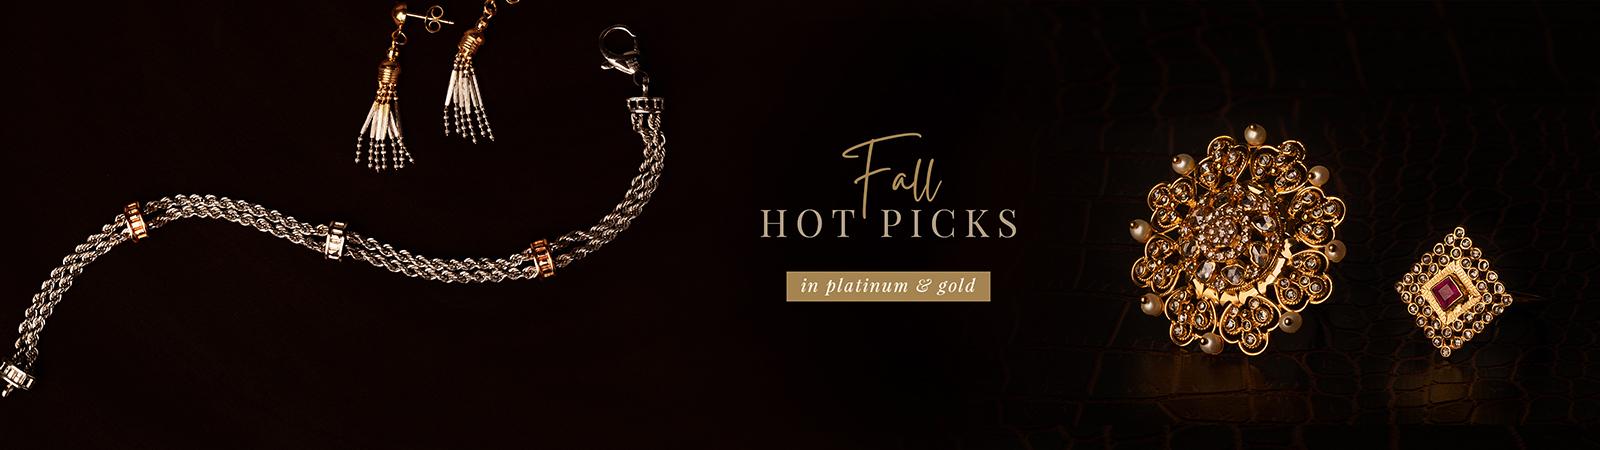 Fall Jewelry picks in 22k gold & diamonds 2021